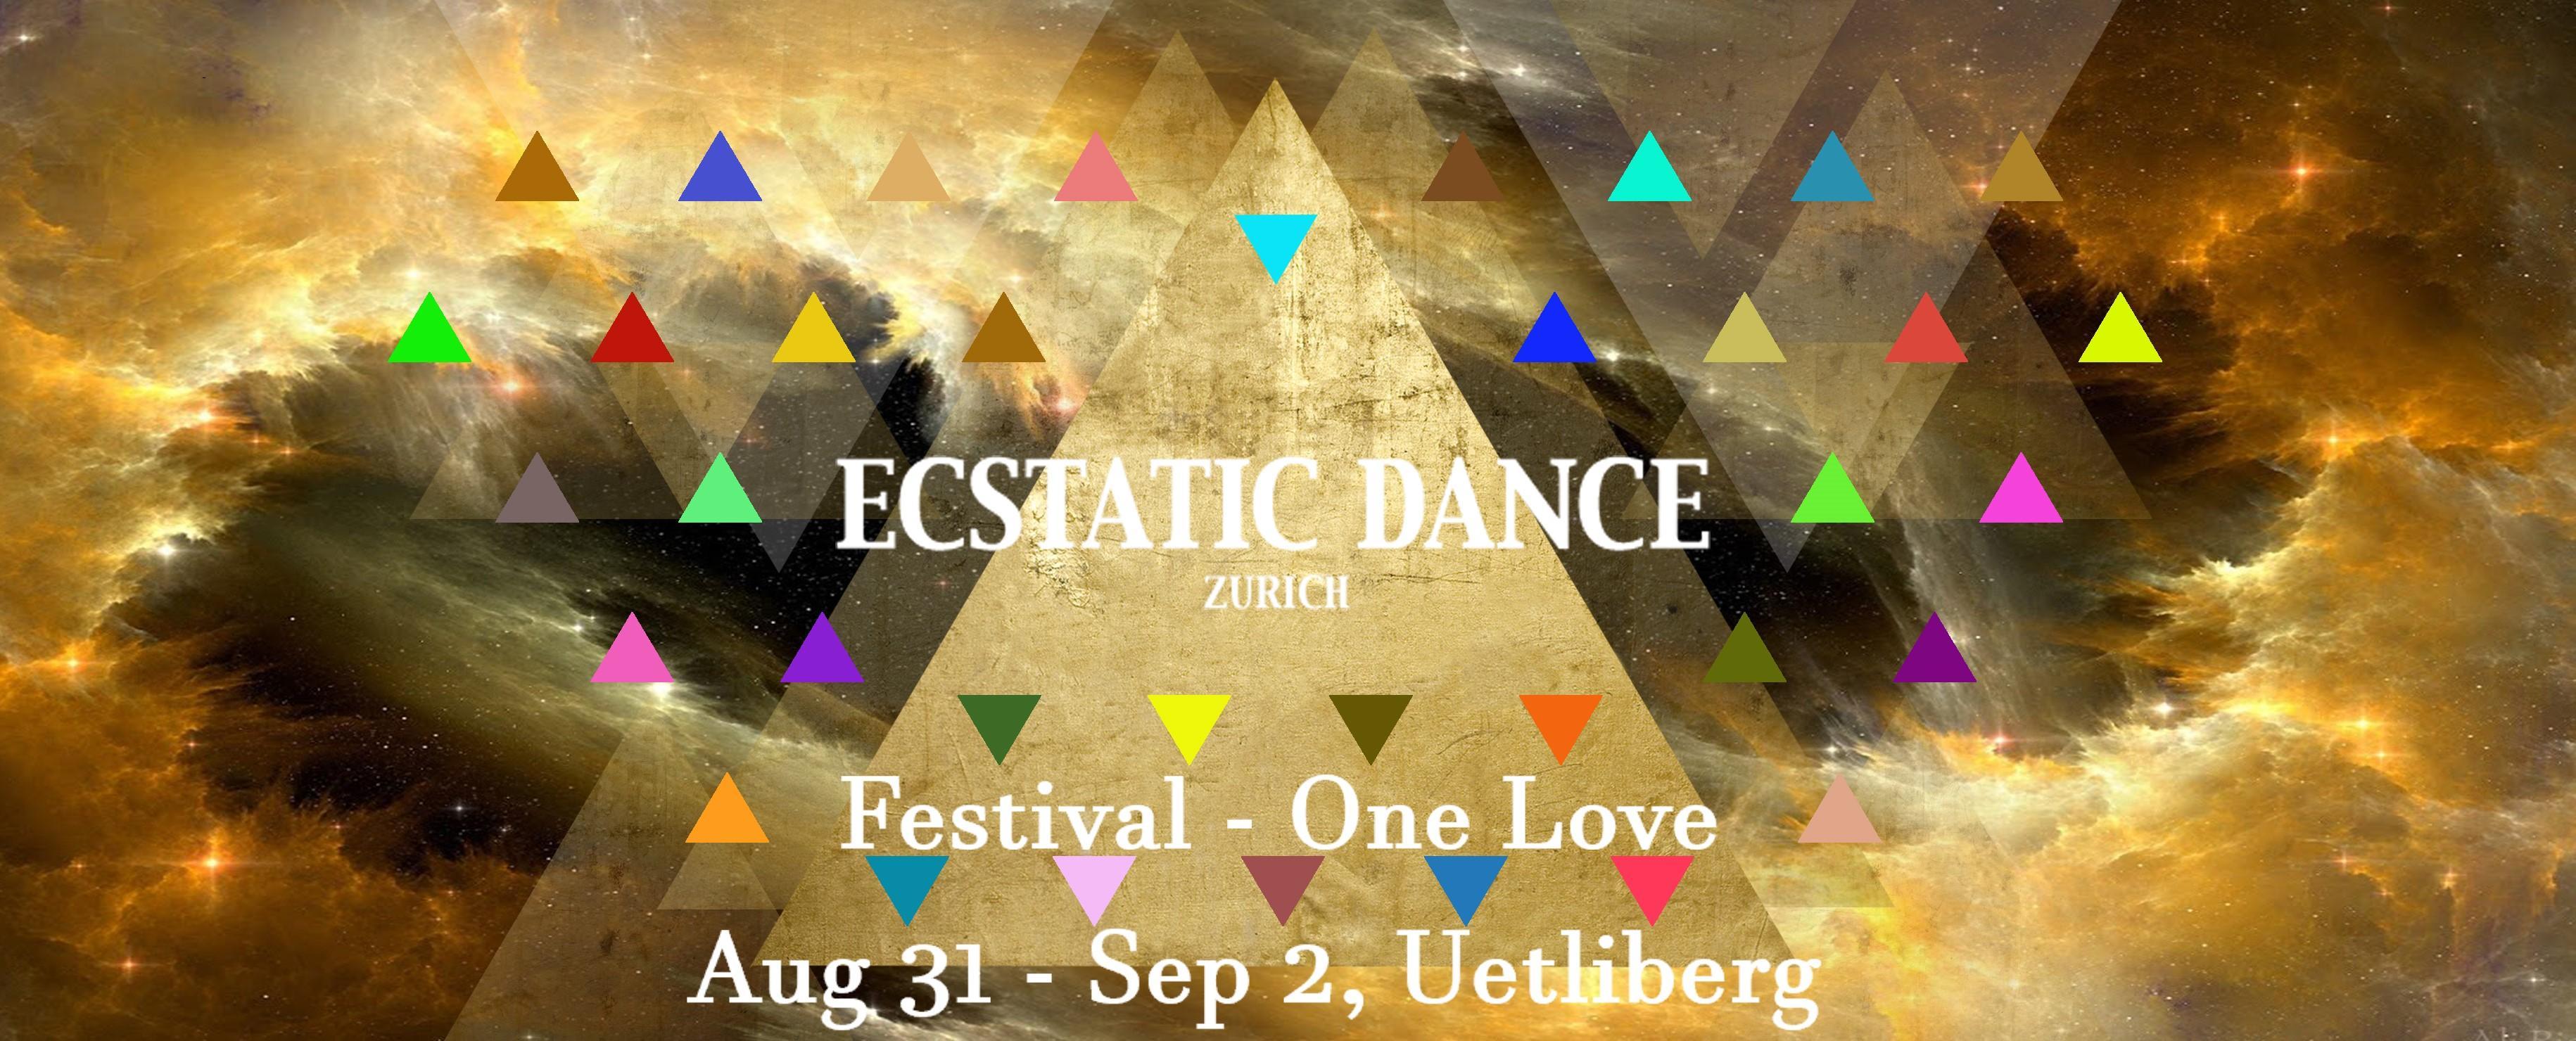 Ecstatic Dance Zürich Festival - One Love